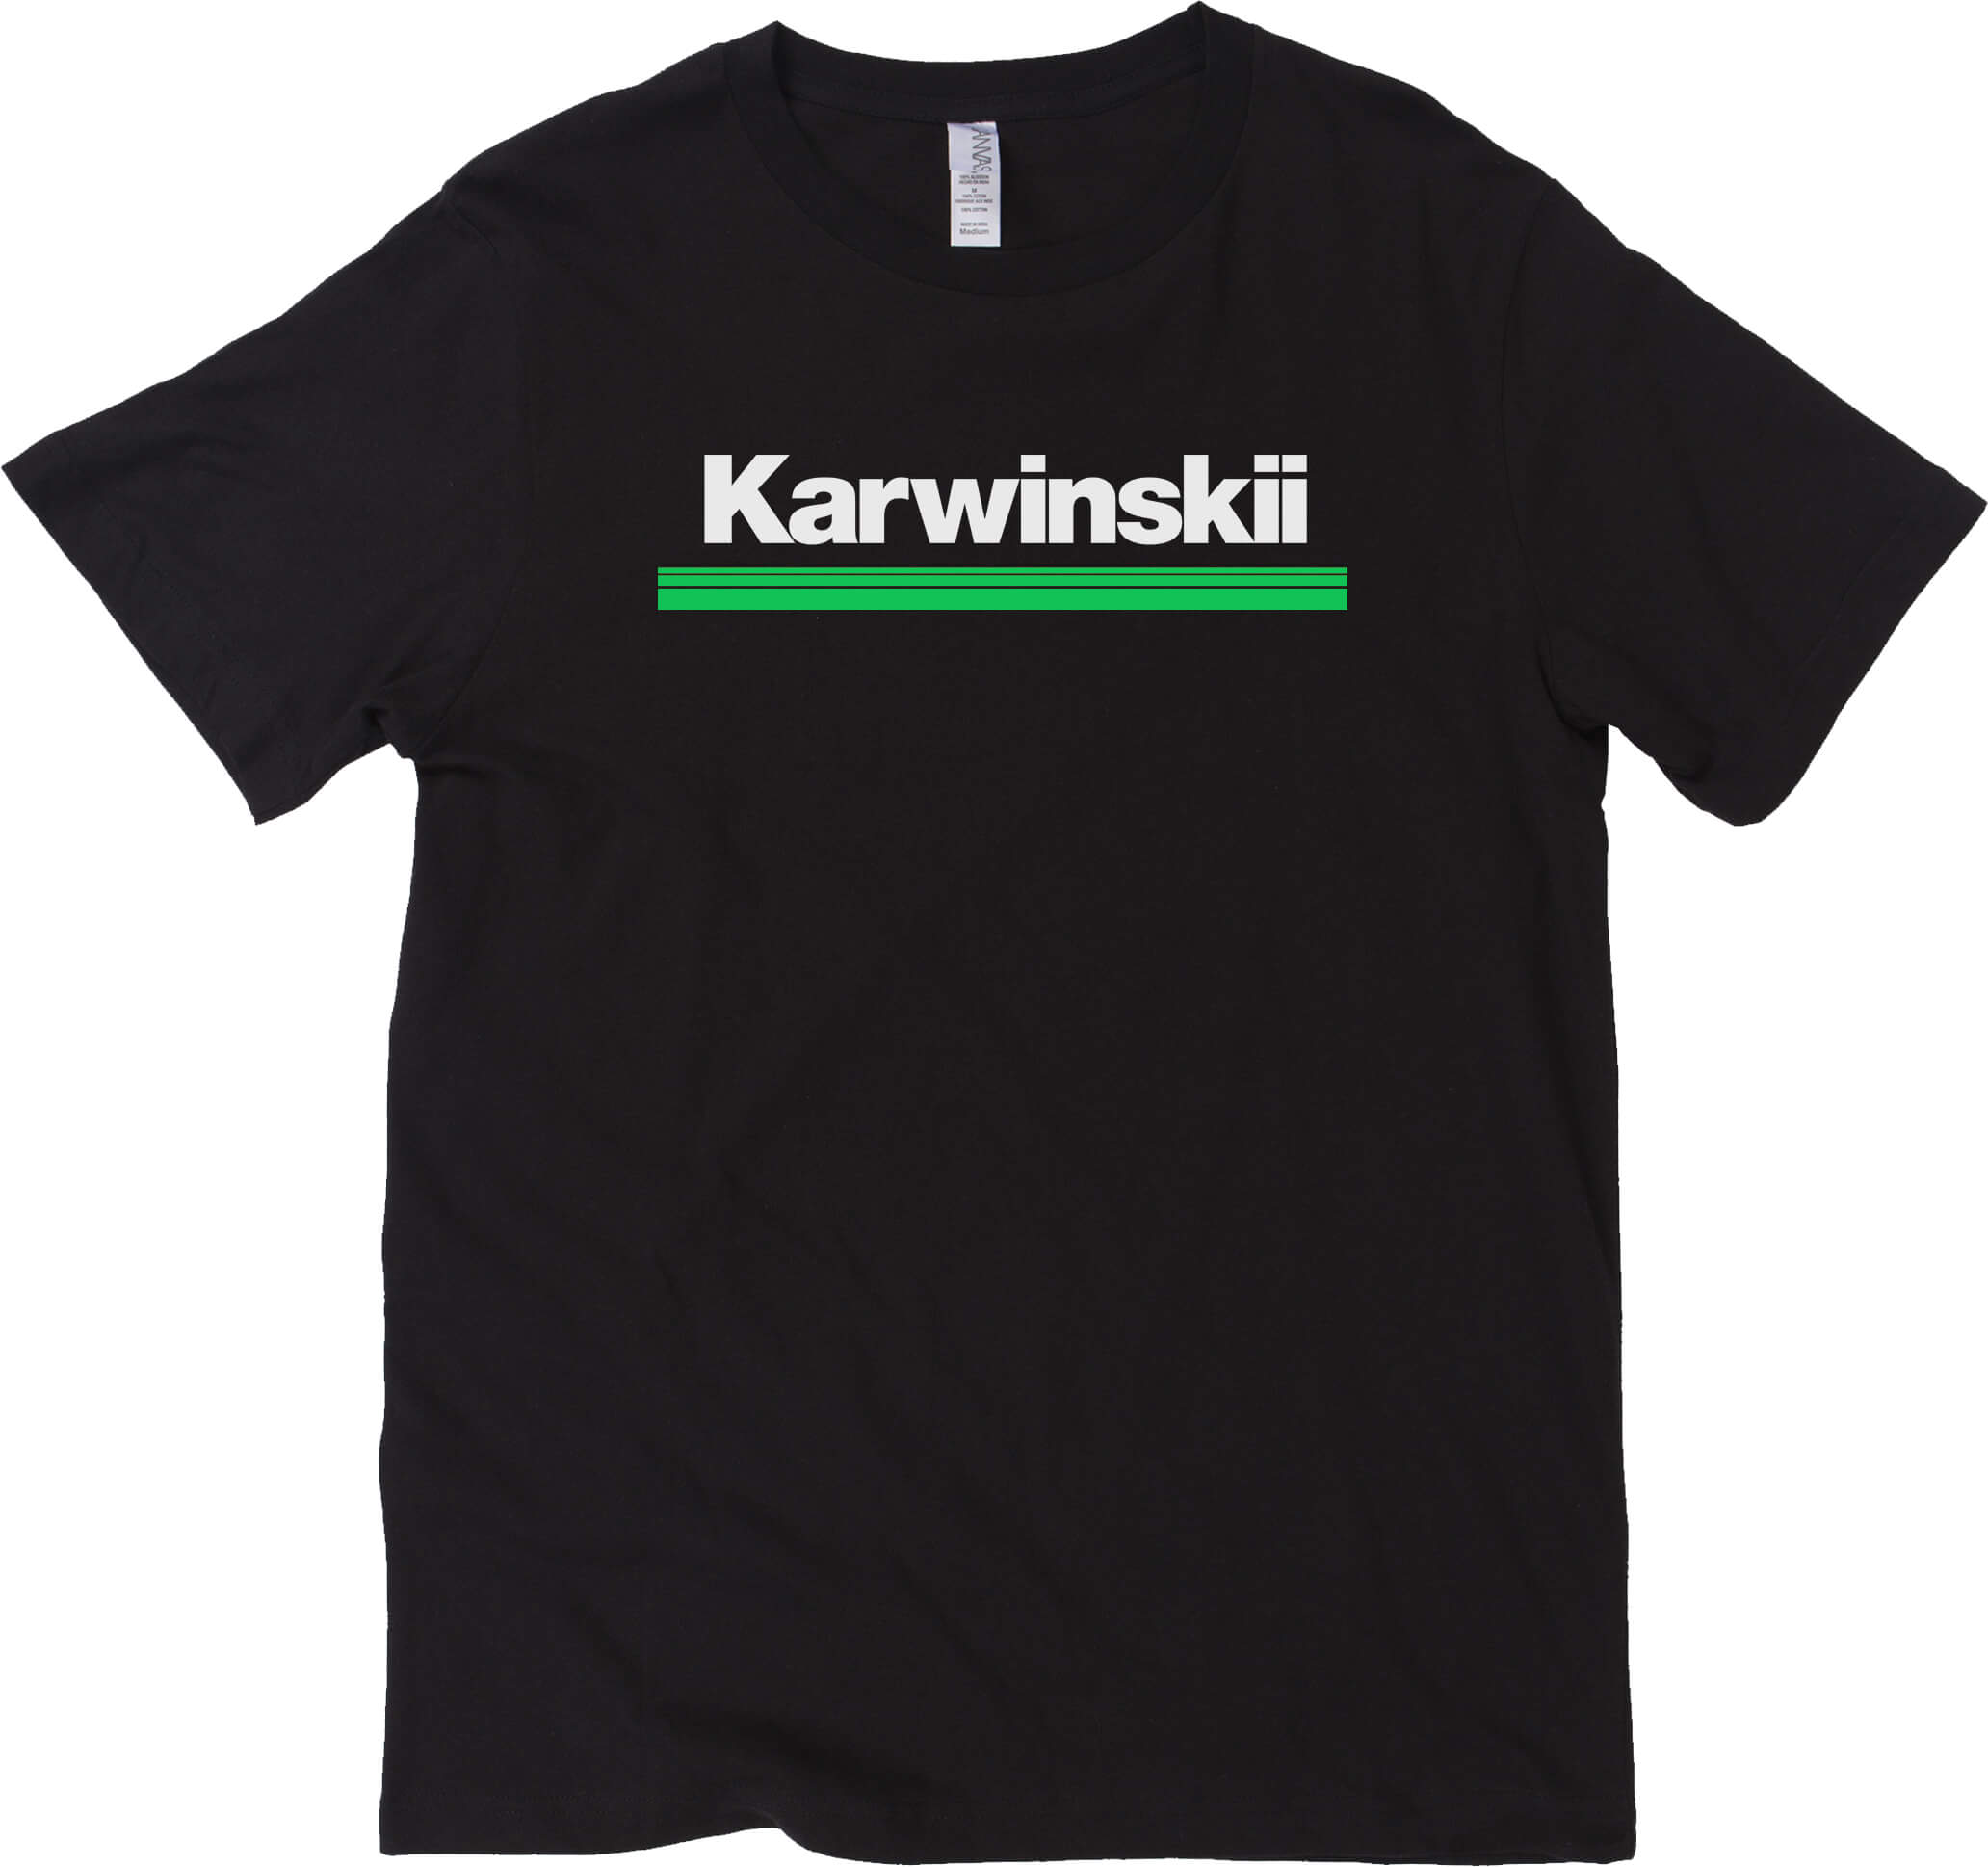 Karwinskii tee from Agaveholics